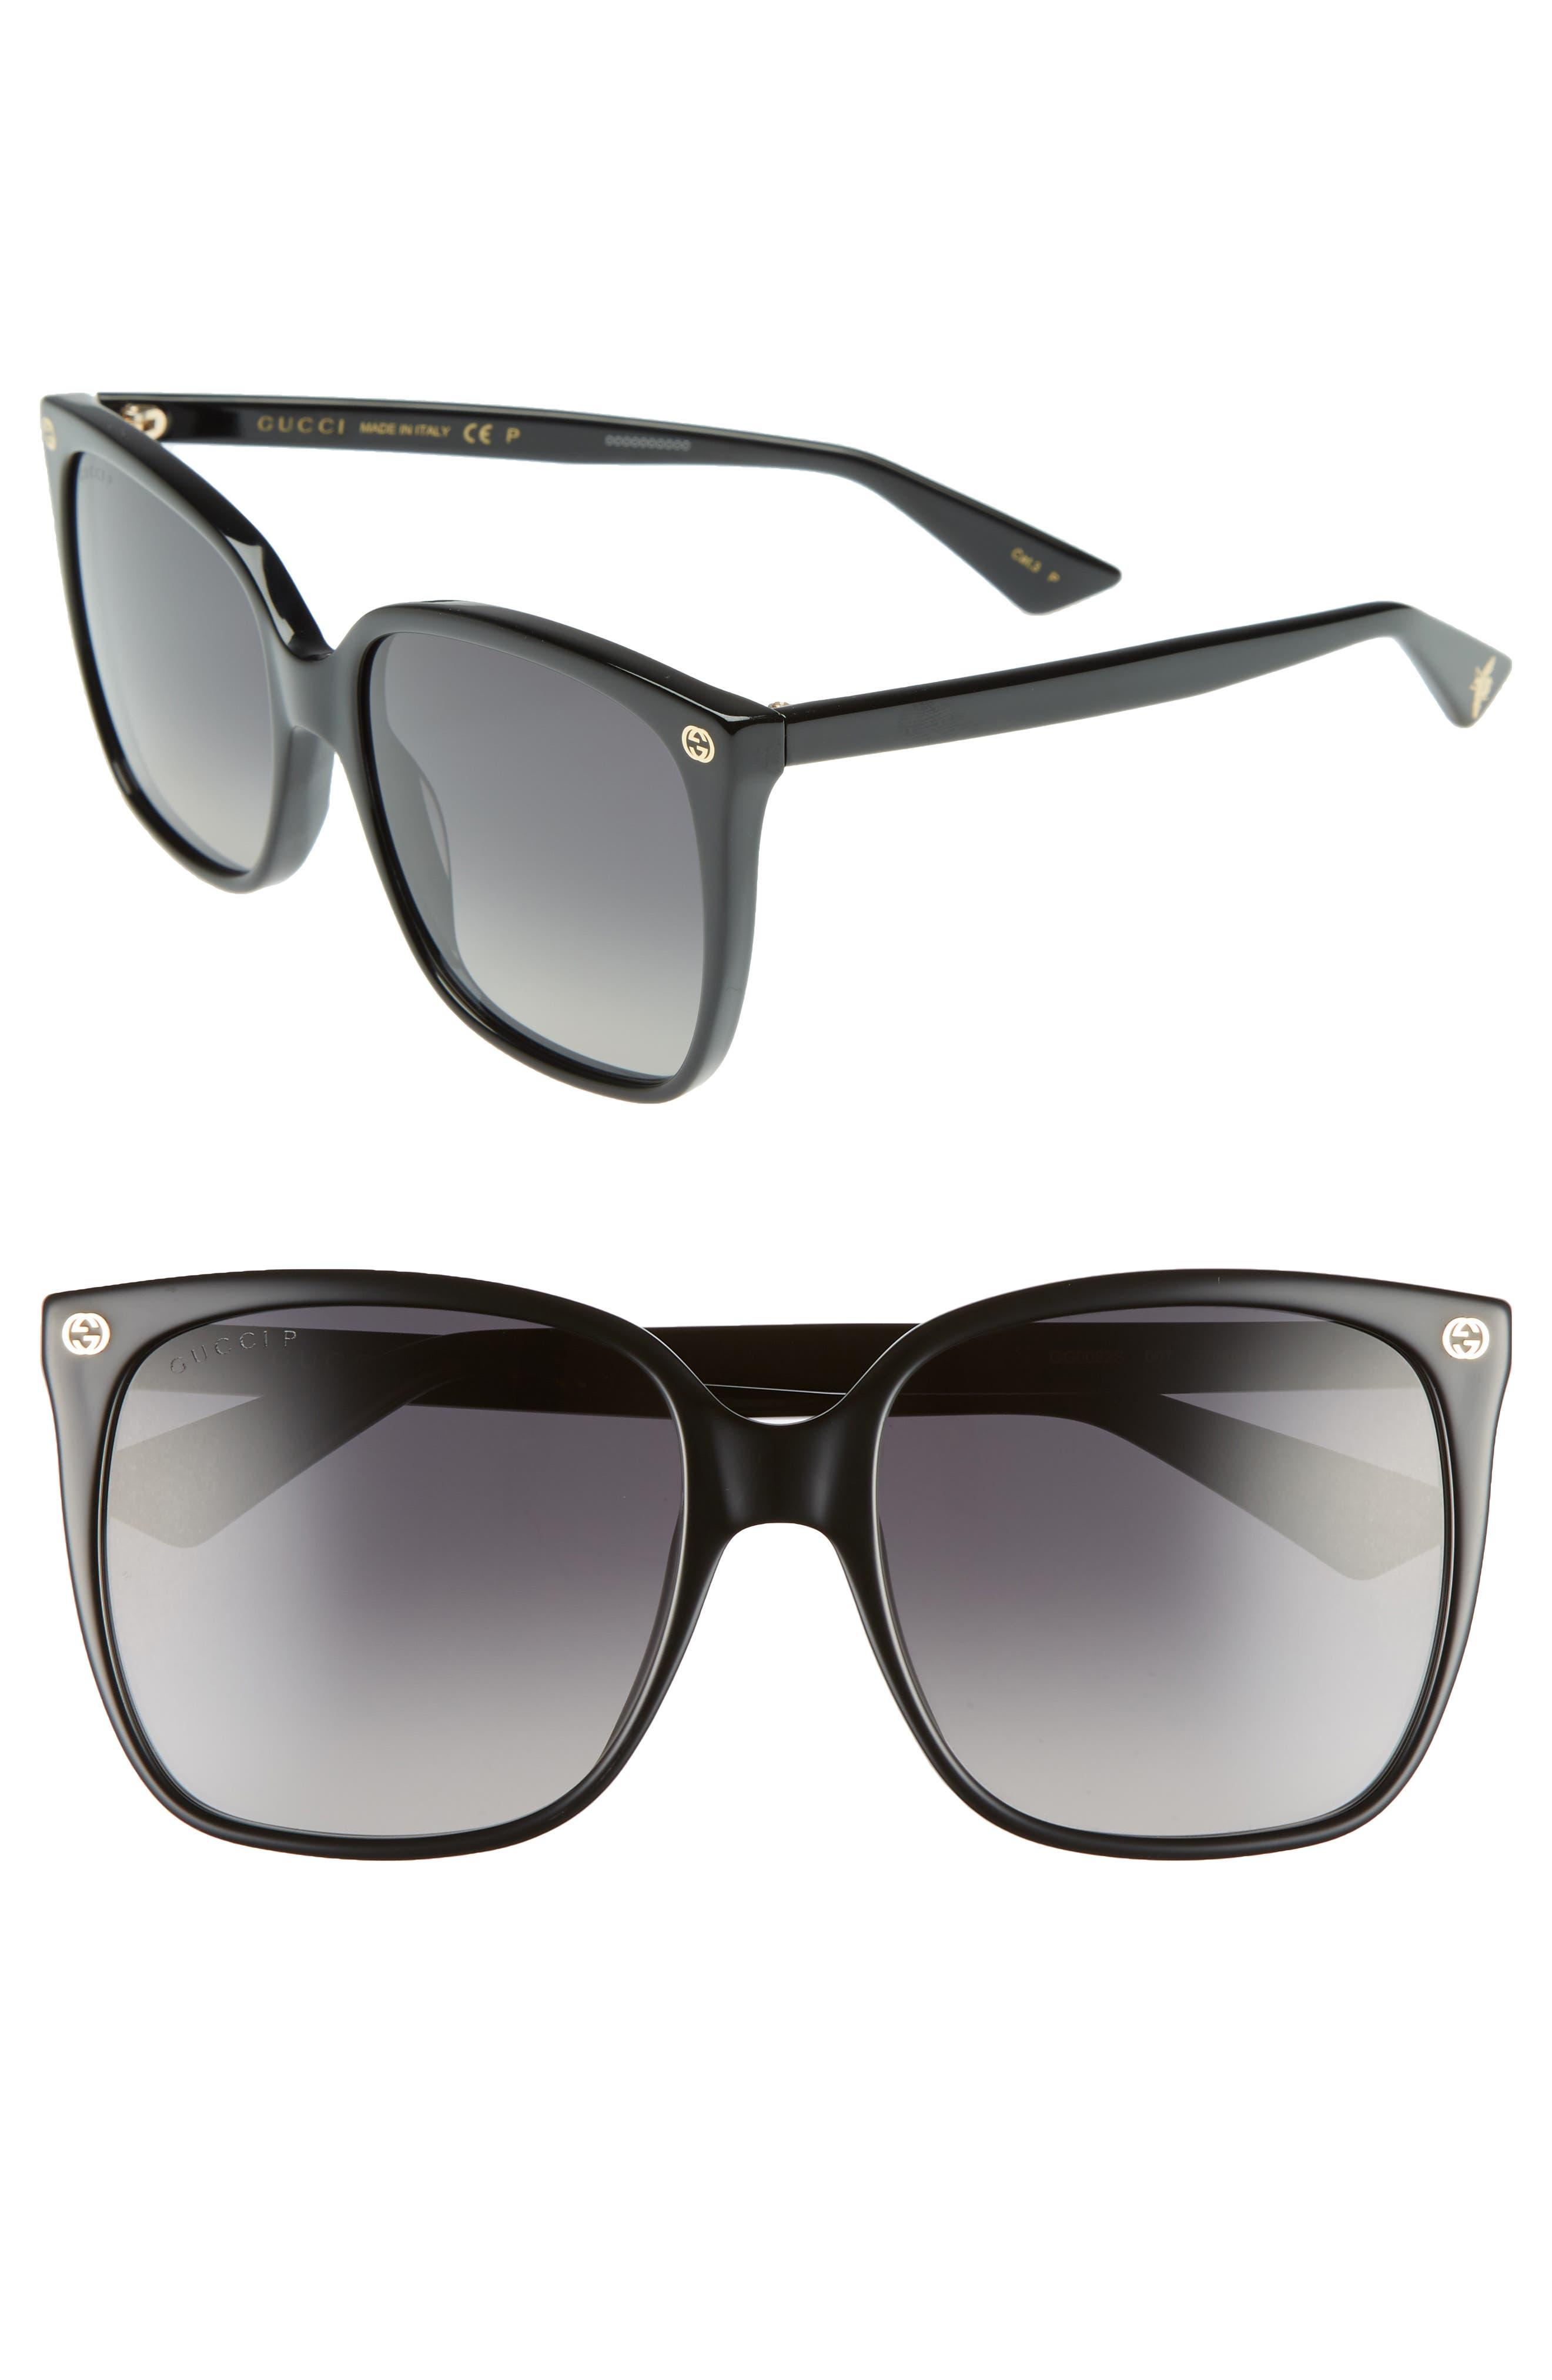 57mm Square Sunglasses,                             Main thumbnail 1, color,                             007